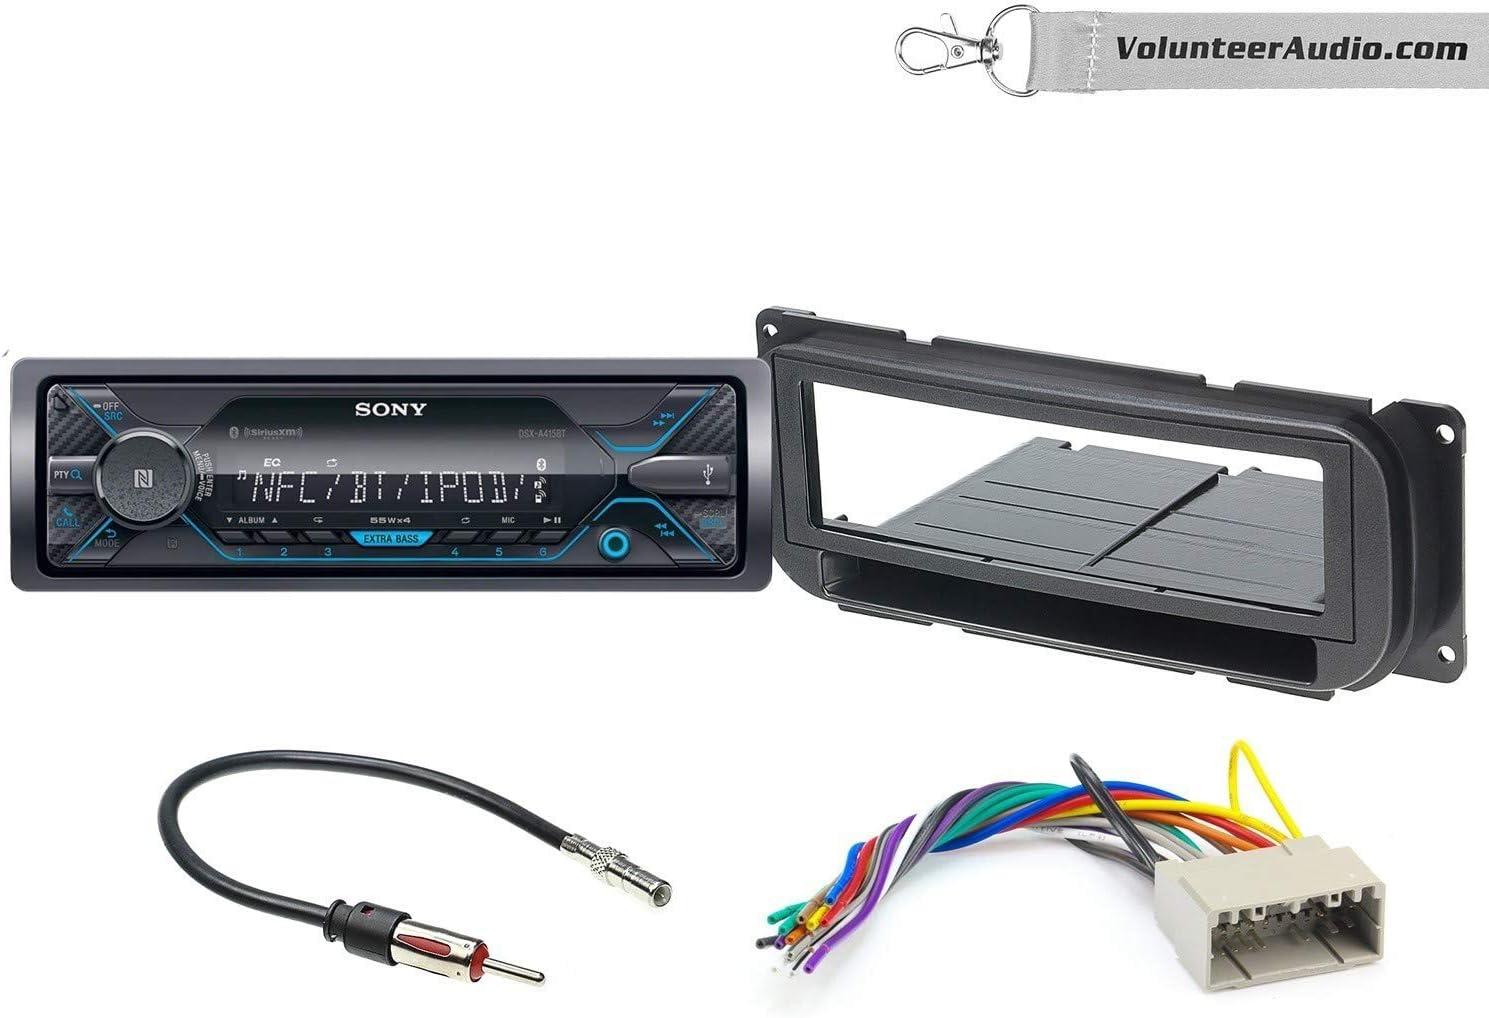 Sony DSX-A415BT Single Din Radio Install Kit With Sirius XM Ready, NO CD Player, AUX/USB Fits 2002-2010 Dodge Ram, Durango, Jeep Wrangler